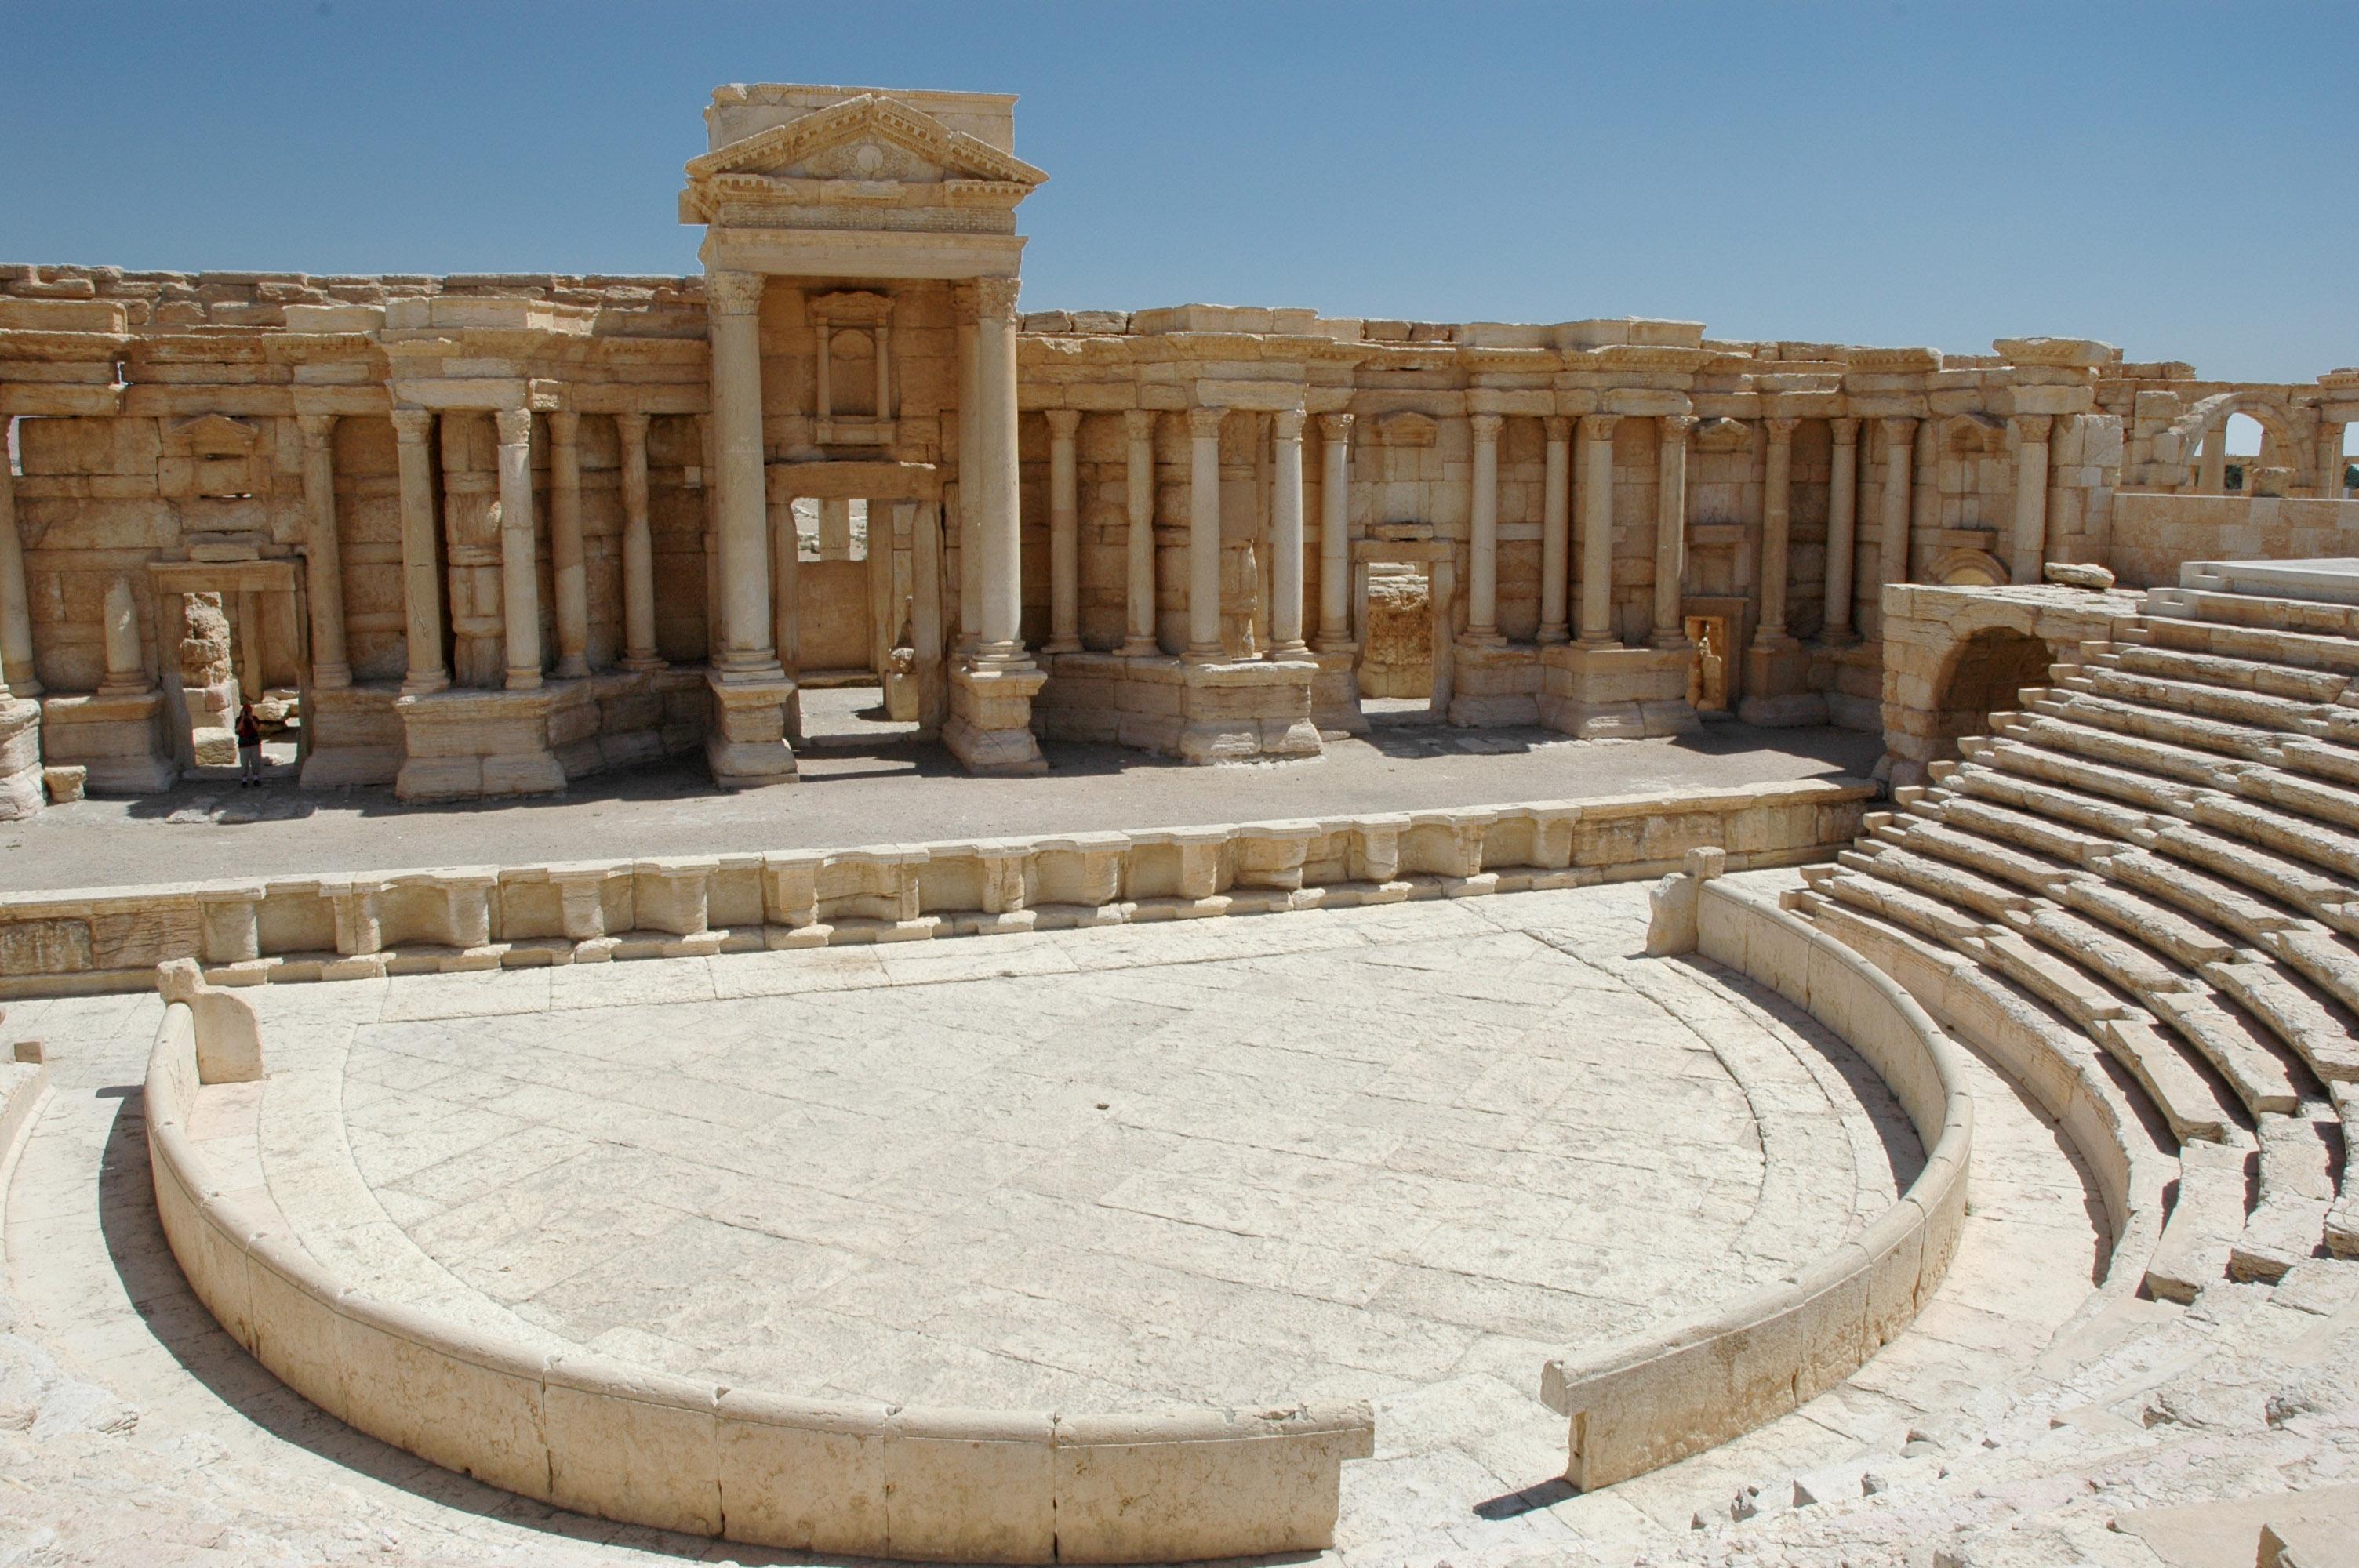 File:Palmira Teatro romano - GAR - 7-01.jpg - Wikimedia Commons